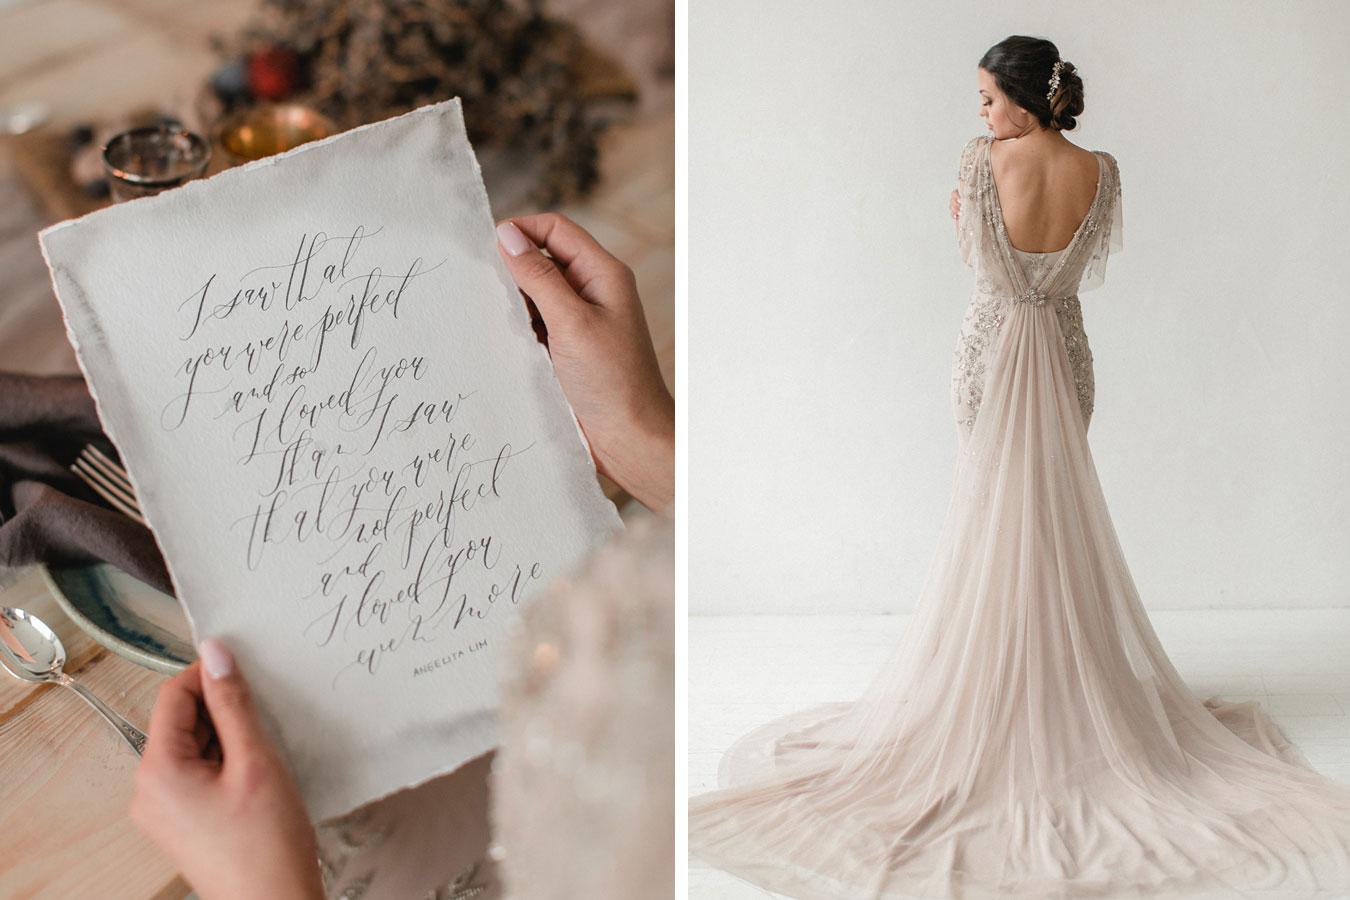 Kalligrafie Liebeszitat